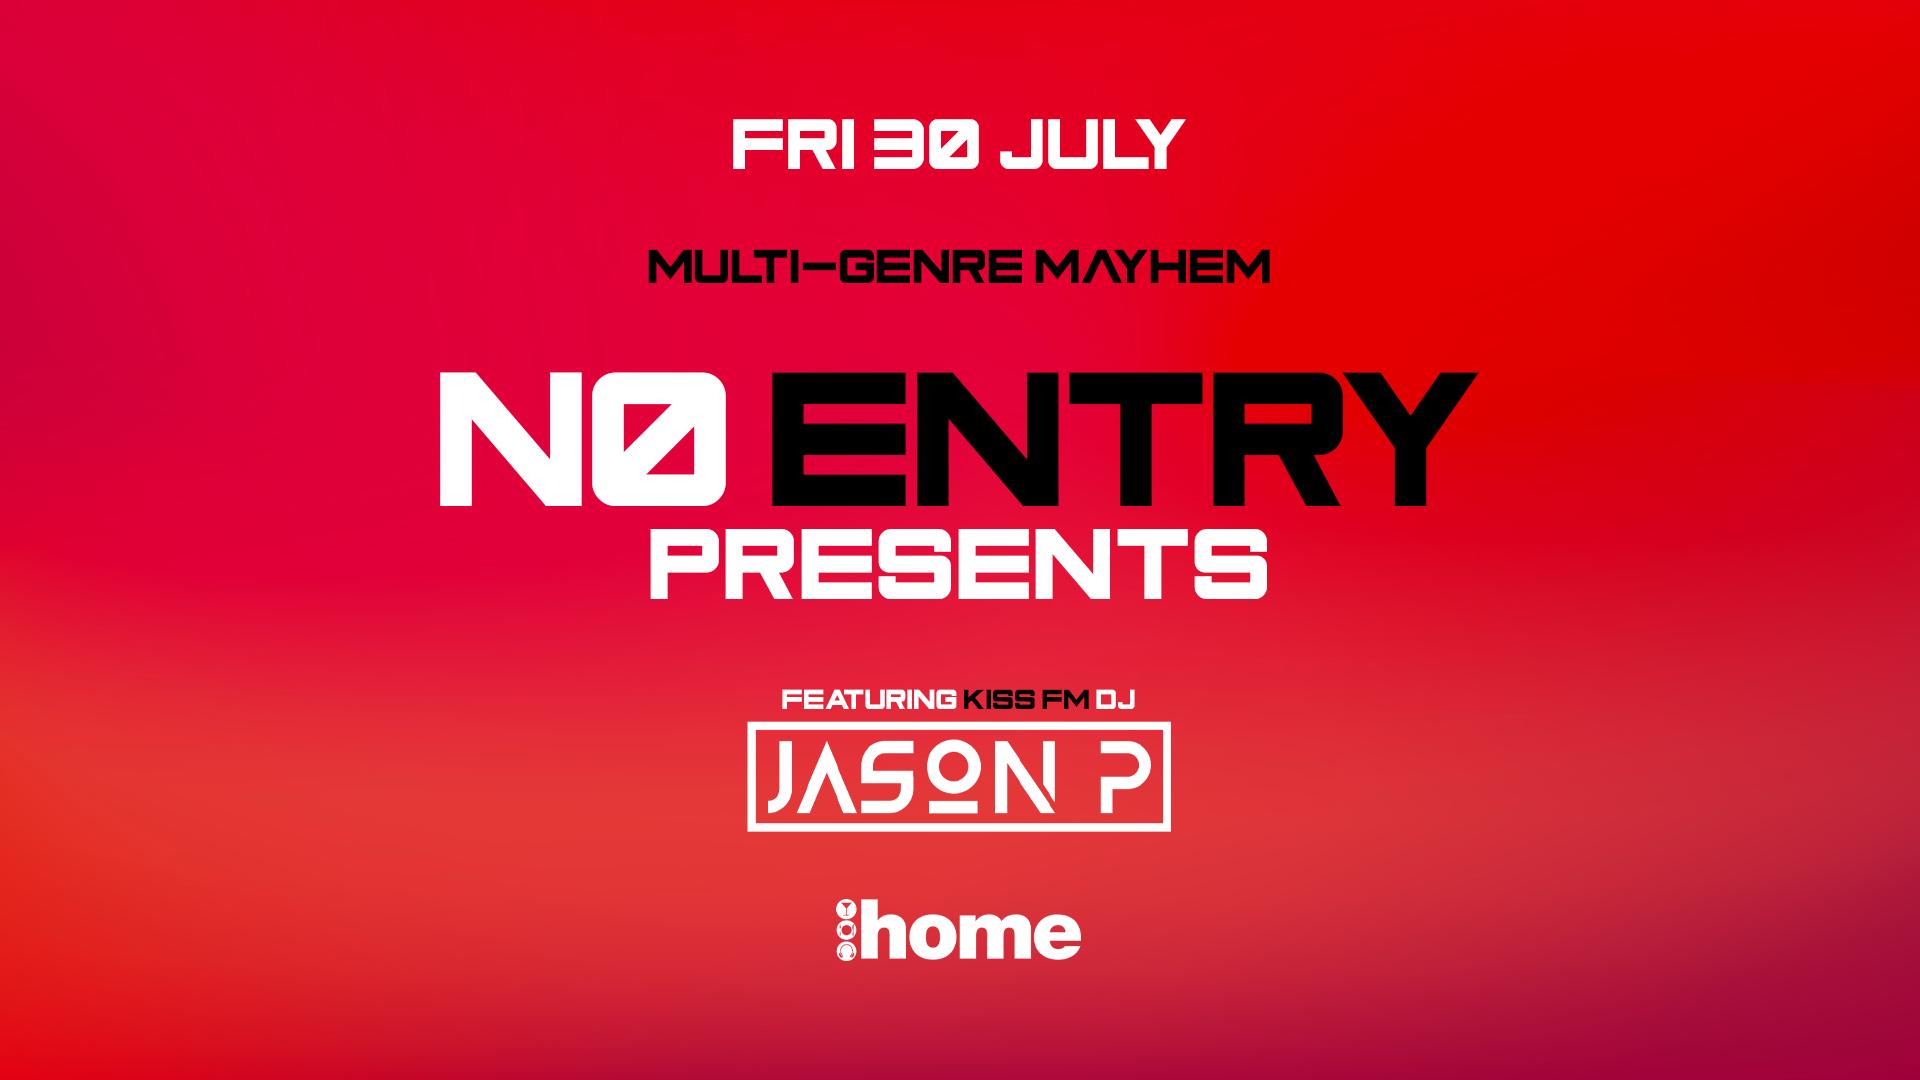 No Entry – Featuring Kiss FM's Jason P